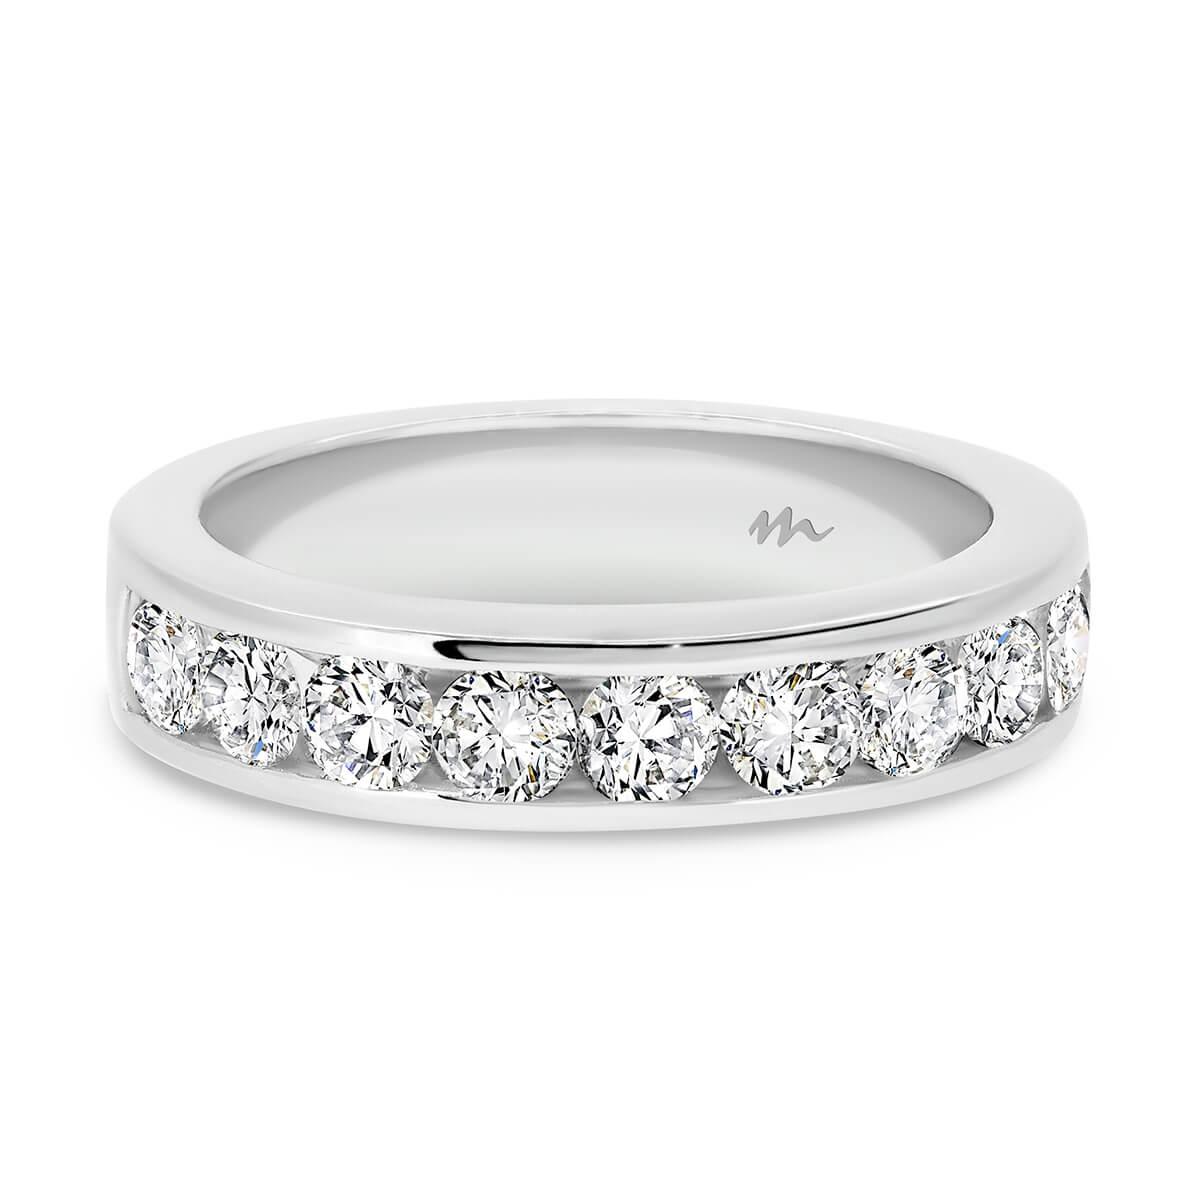 Carmen 3.0 channel set Moissanite half band wedding ring